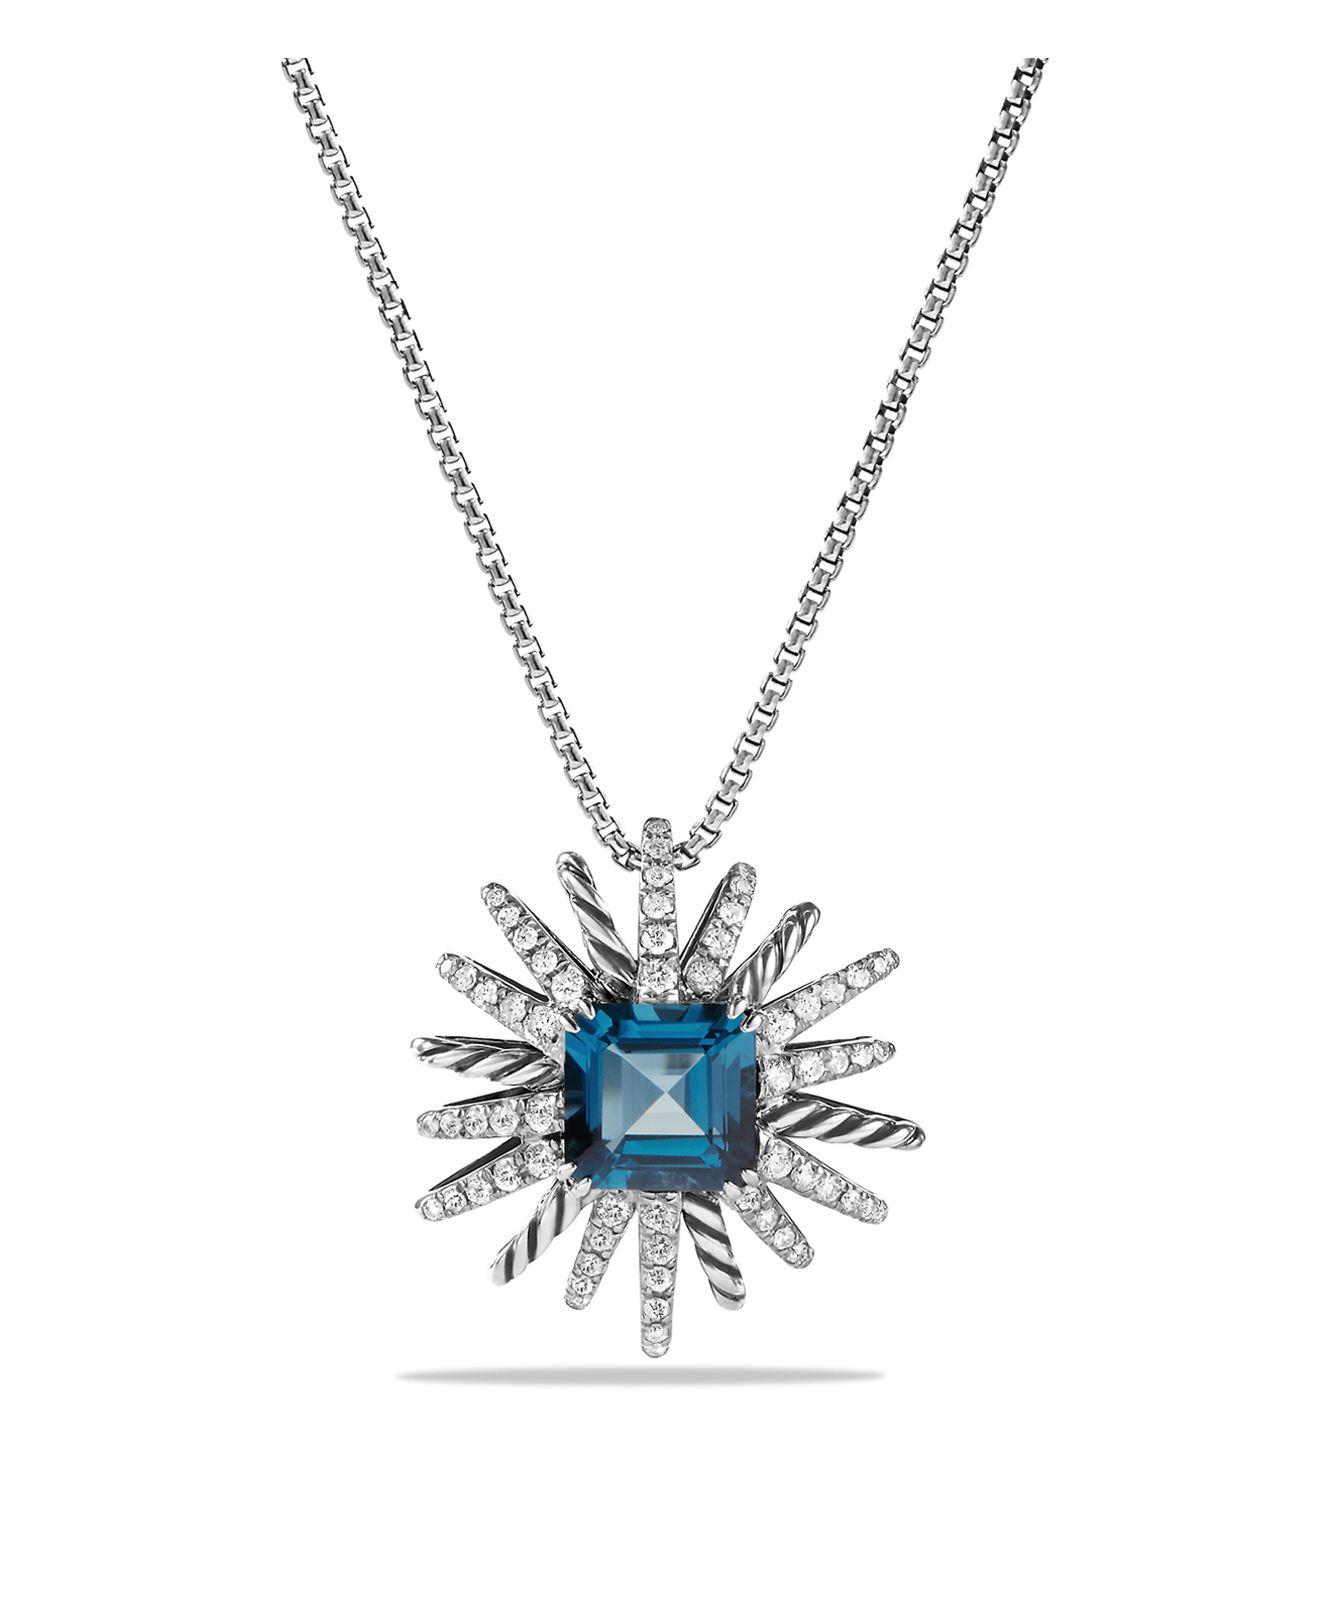 david yurman starburst necklace with diamonds and hton